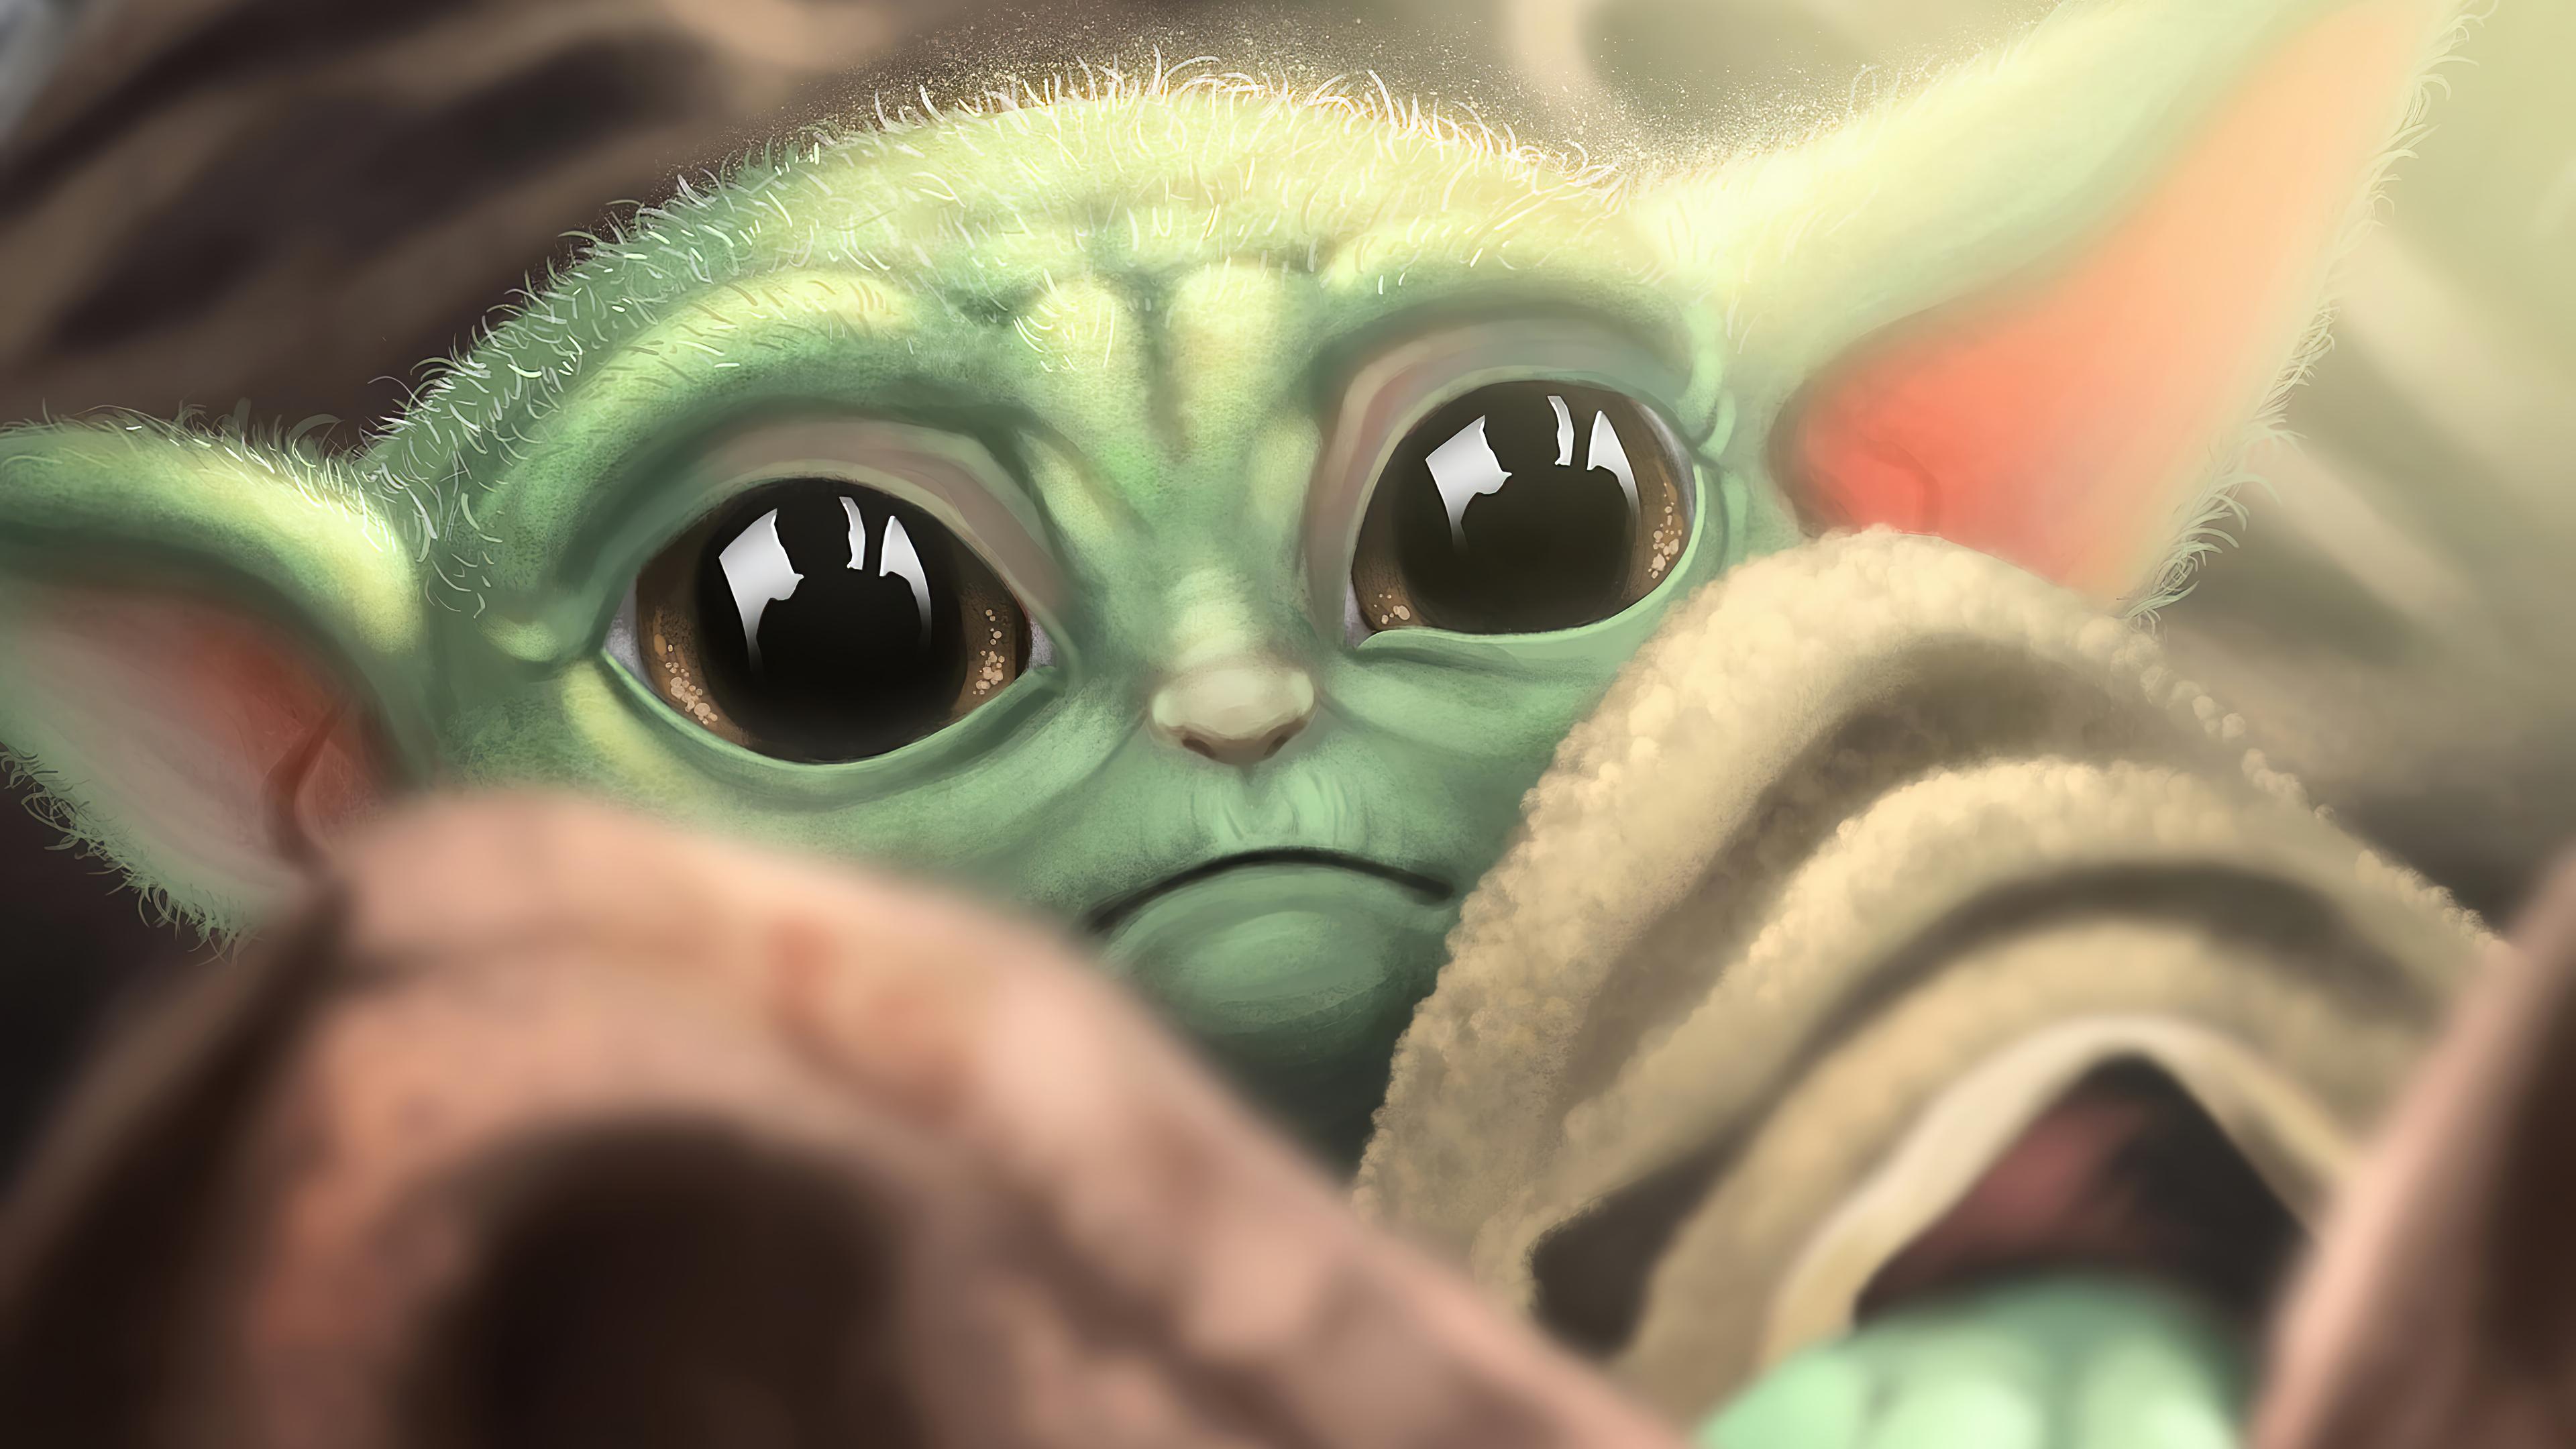 Baby Yoda Full Hd 3840x2160 Wallpaper Teahub Io